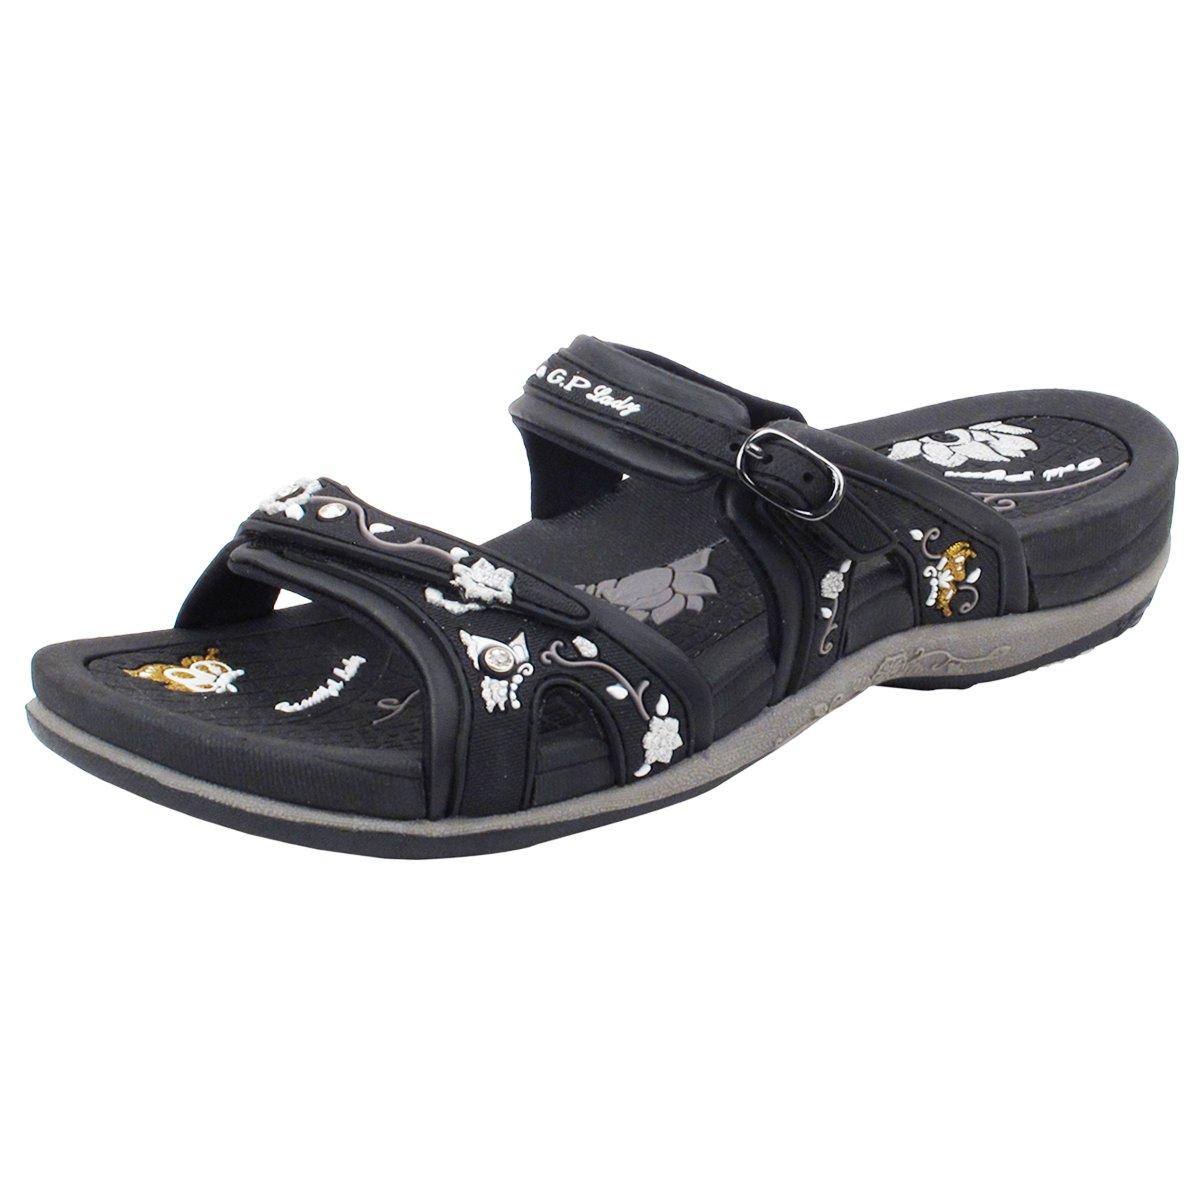 777c01f9aa9e Gold Pigeon Shoes Signature Sandal  Comfort Walking Ergonomic Flip Flops